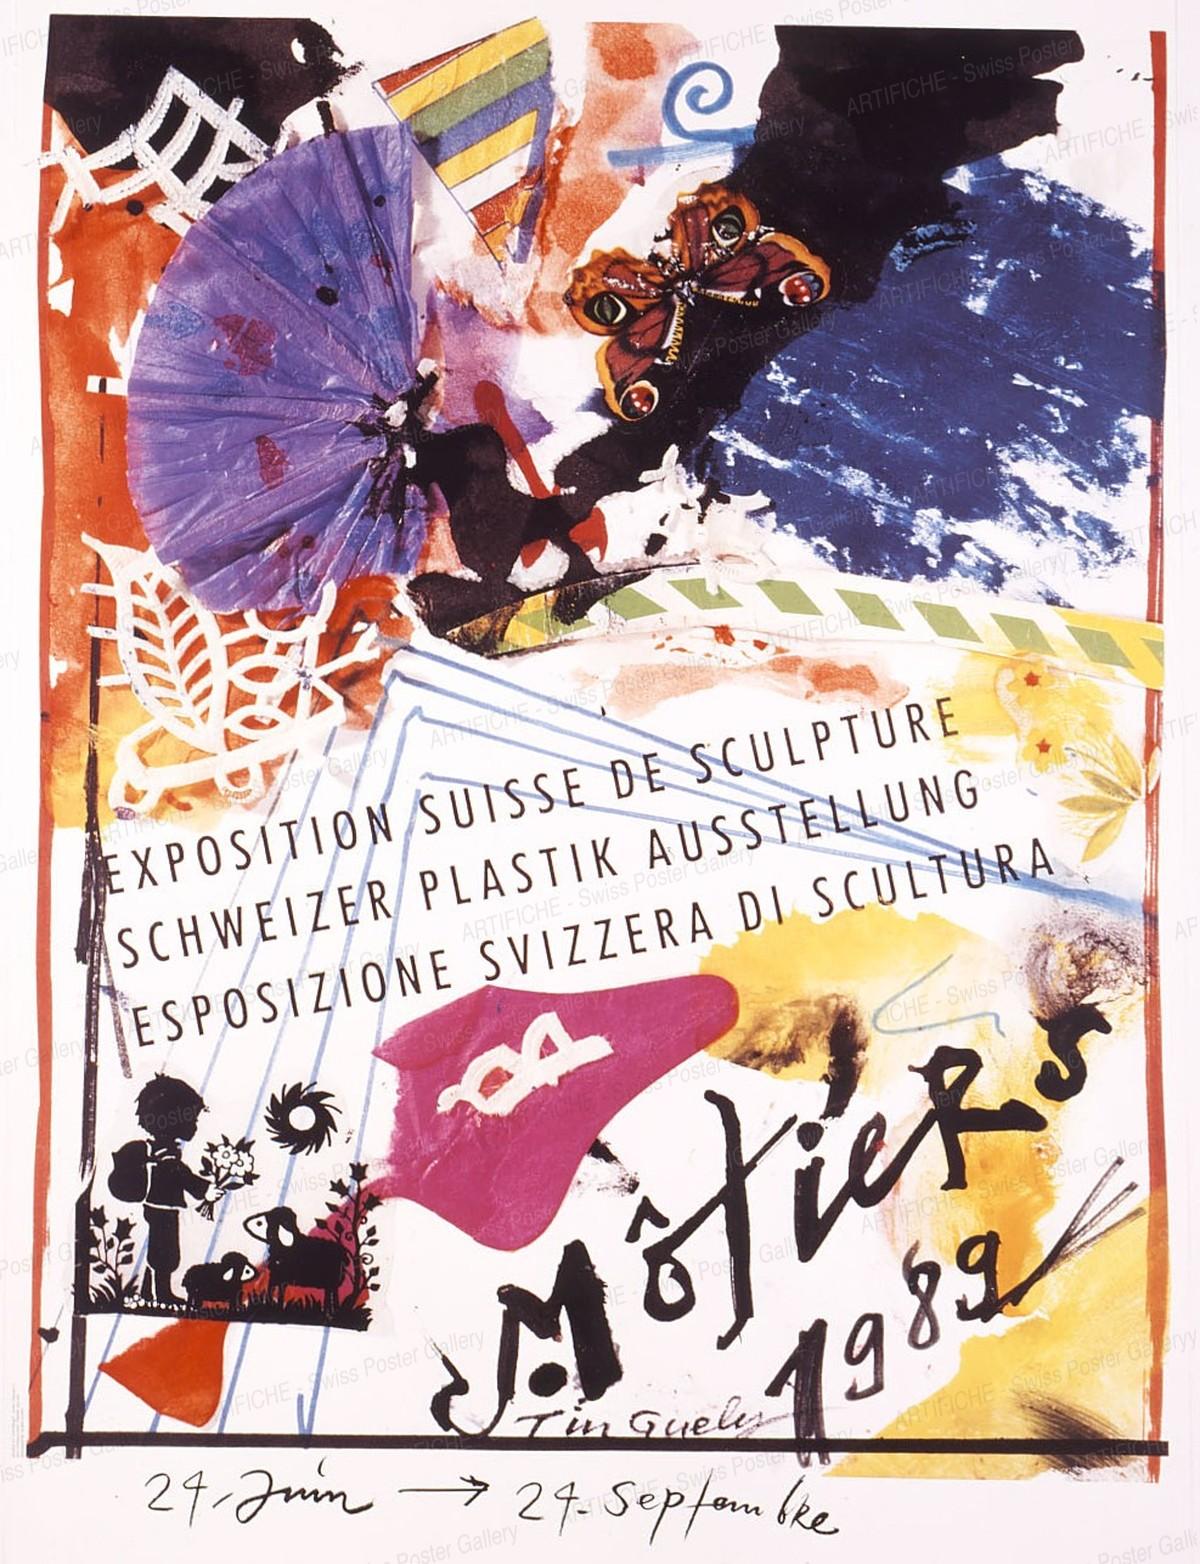 Exposition Suisse de Sculpture – Schweizer Plastik Ausstellung – Esposizione Svizzera di Scultura – Motiers 1989, Jean Tinguely